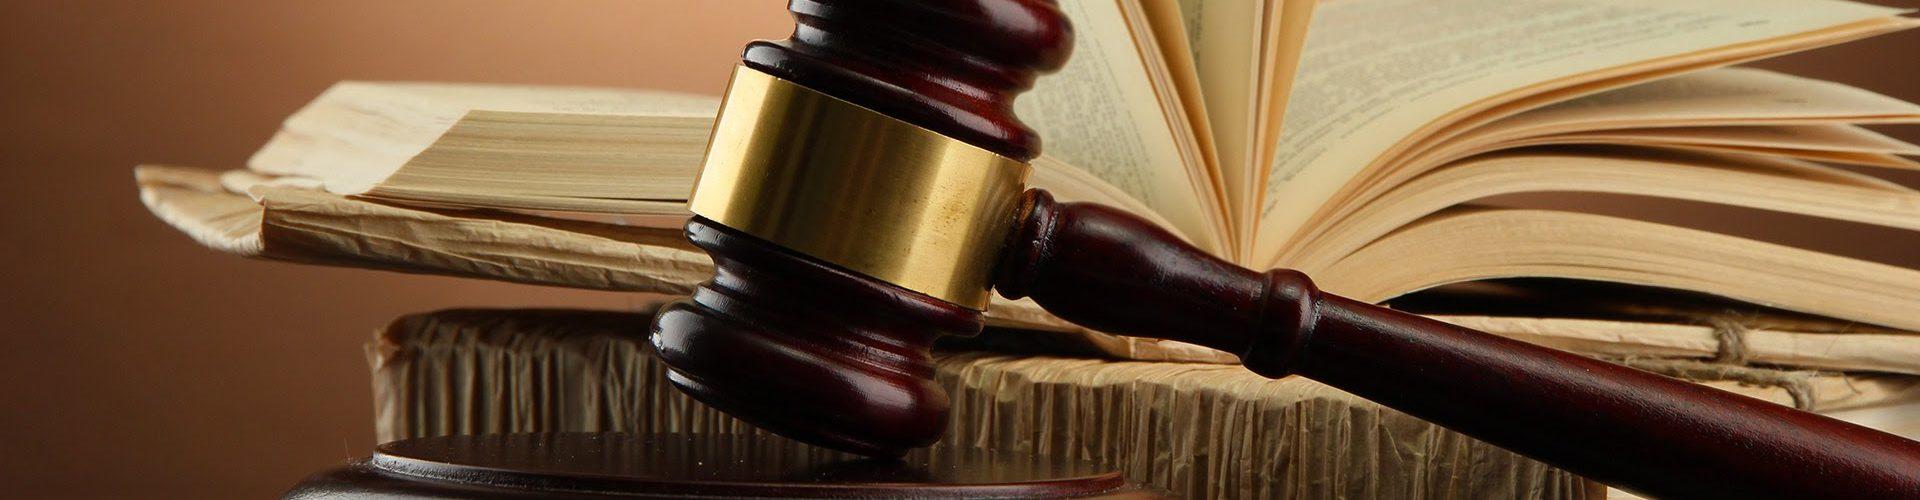 консультация финансового юриста